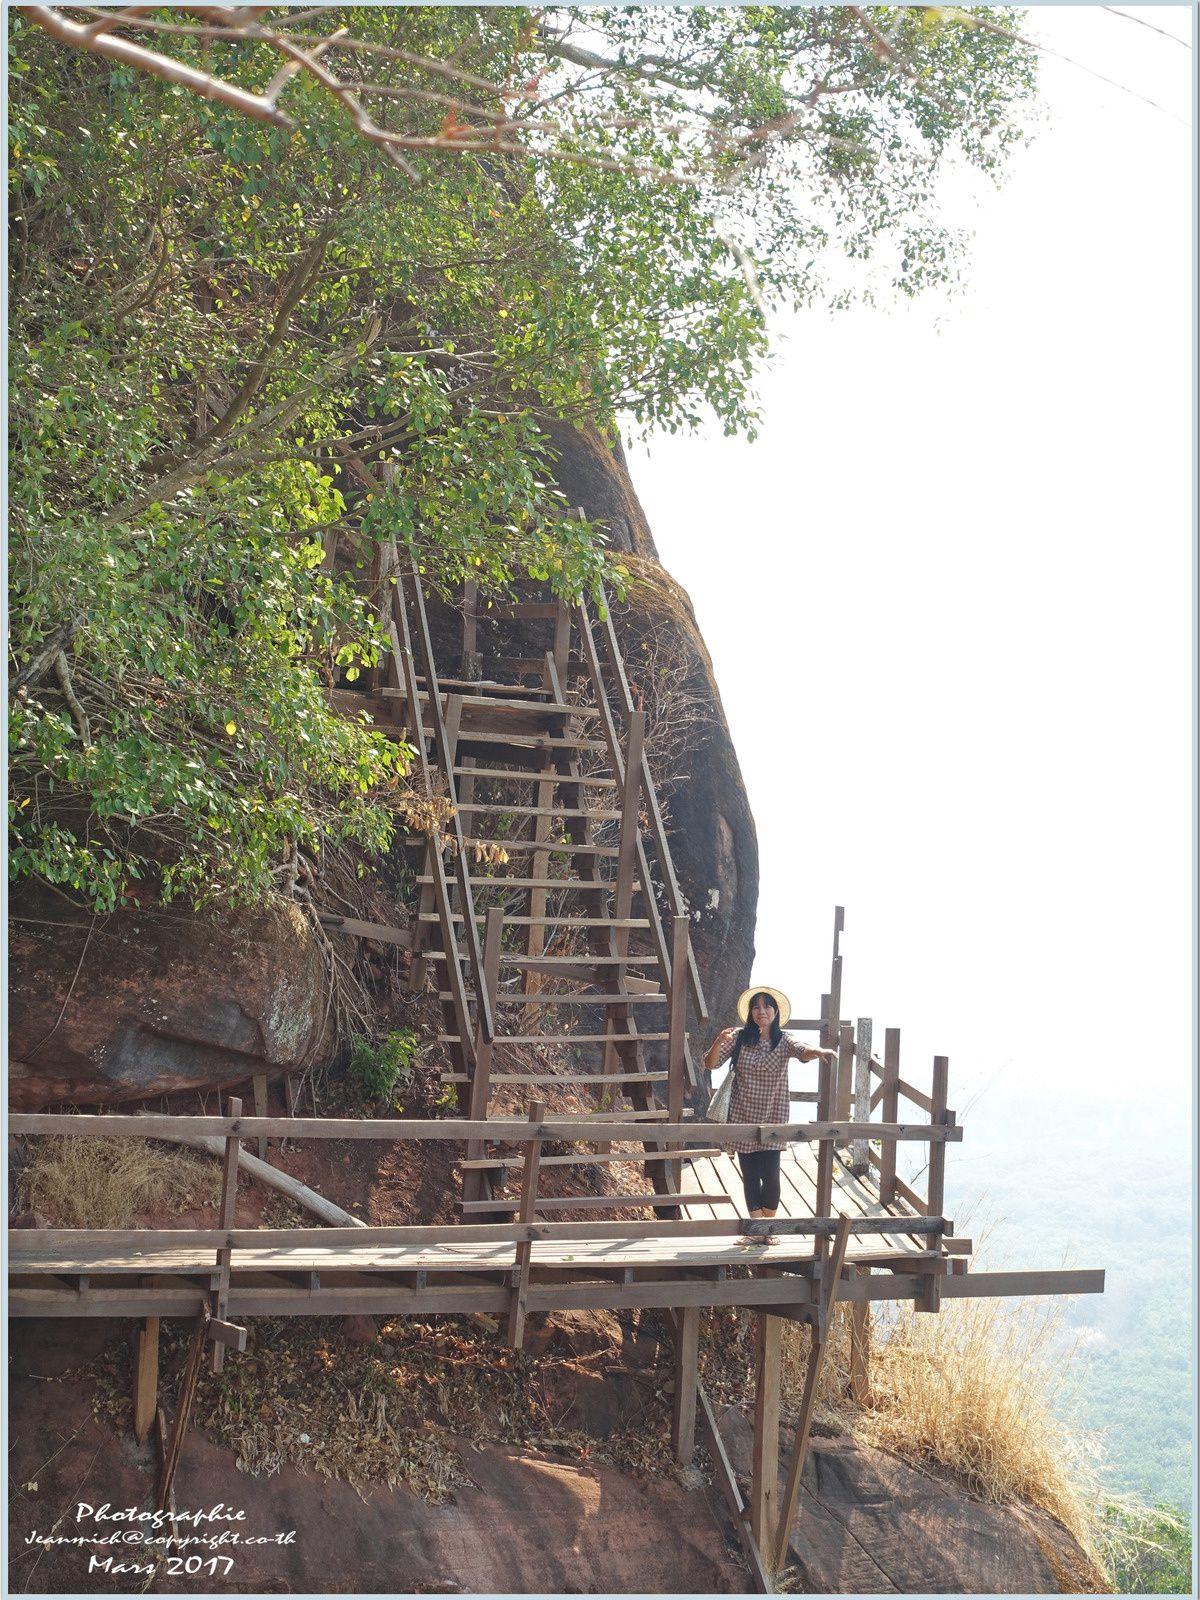 Wat Phu Tok (พุทธวิหาร) province de Bueng Kan Thaïlande